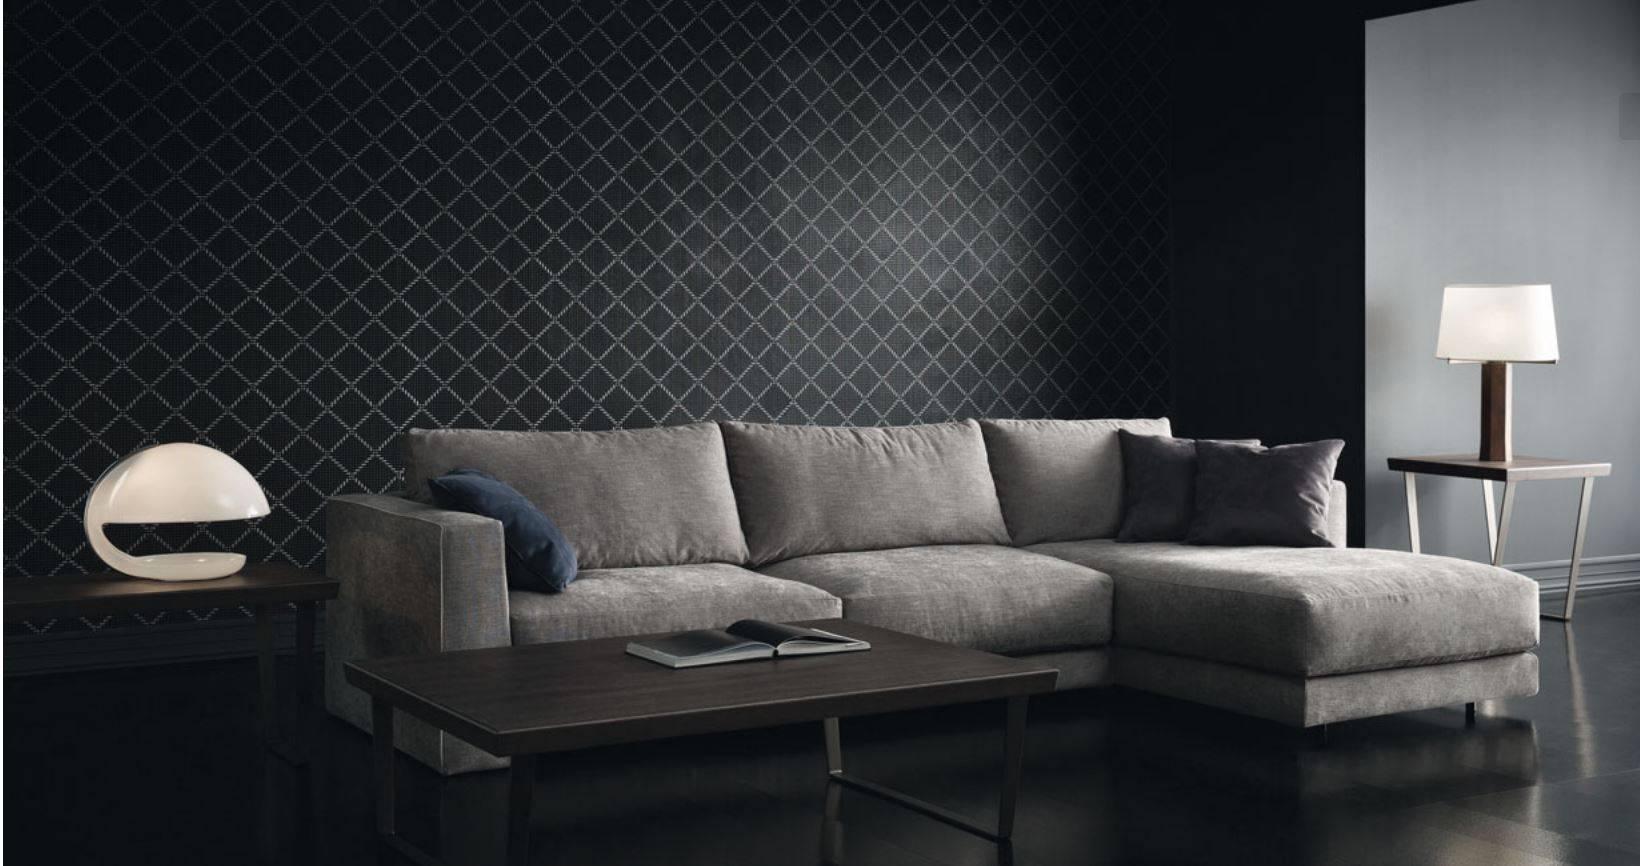 Italian Sofas At Momentoitalia - Modern Sofas,designer Sofas inside Down Feather Sectional Sofa (Image 19 of 30)